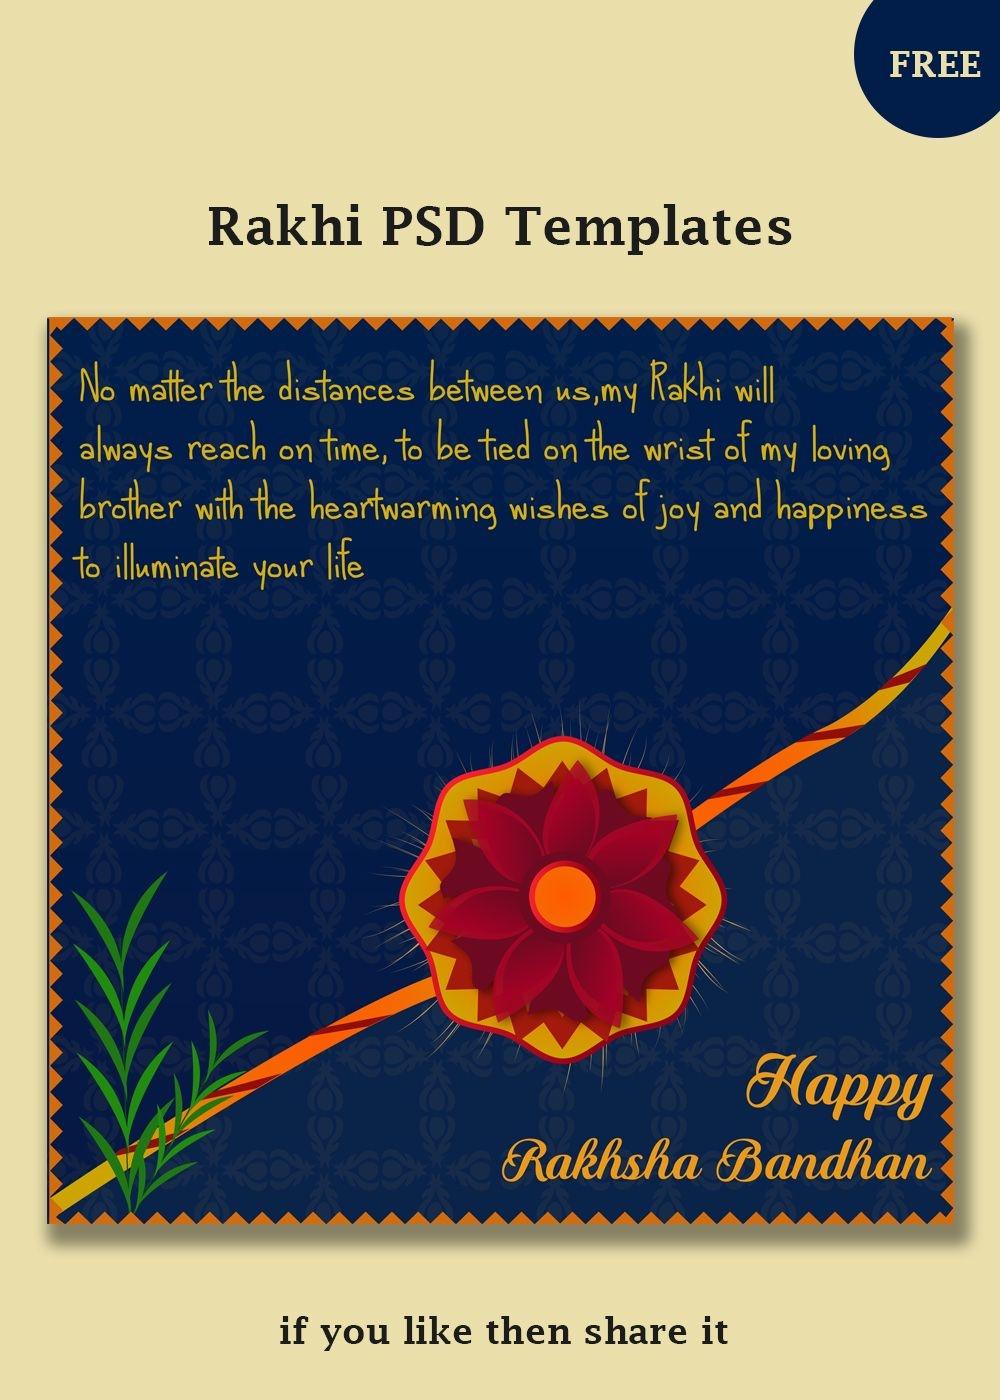 Free Rakhi Vector Templates   Social Post Design   Templates, Rakhi - Free Online Printable Rakhi Cards